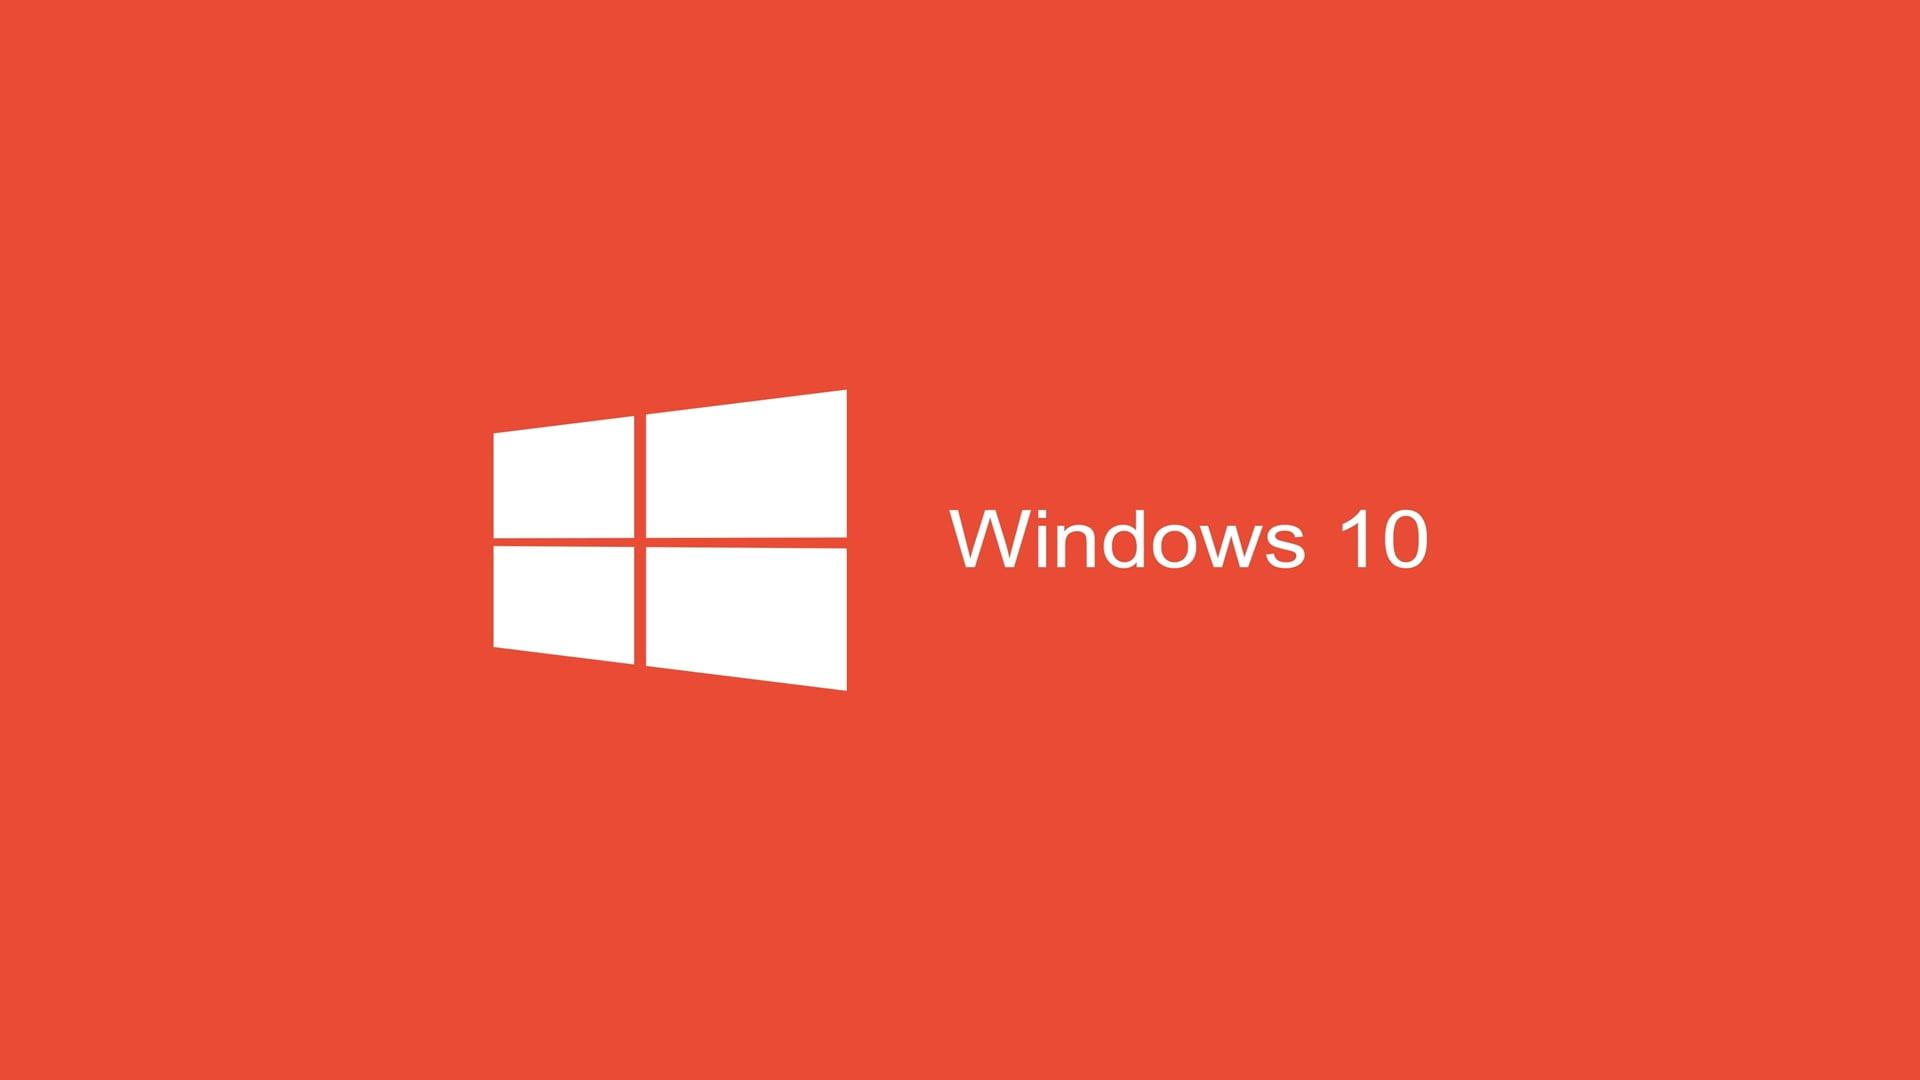 Papéis de parede do Windows 10 8